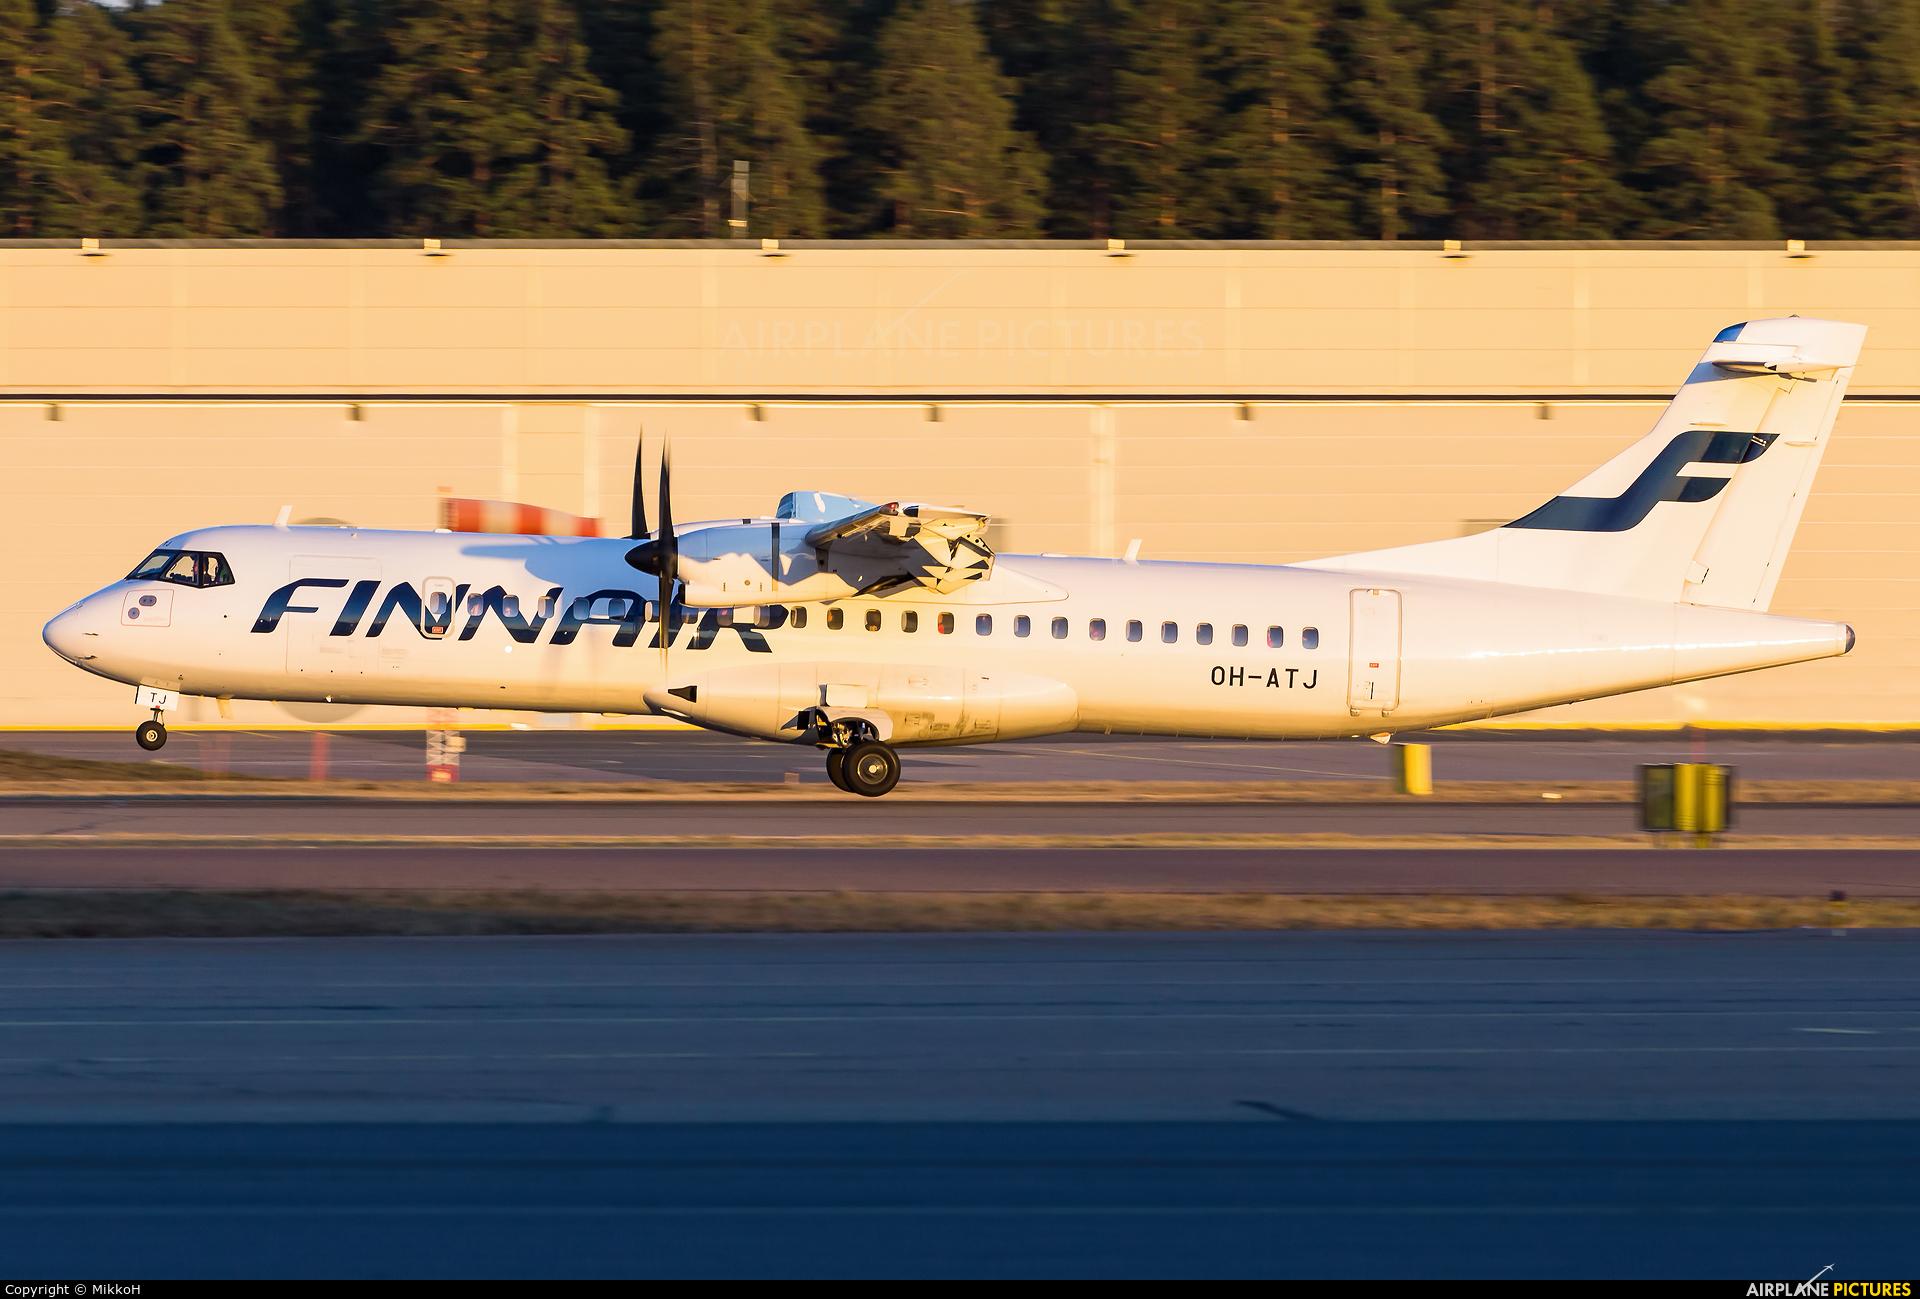 Finnair OH-ATJ aircraft at Helsinki - Vantaa